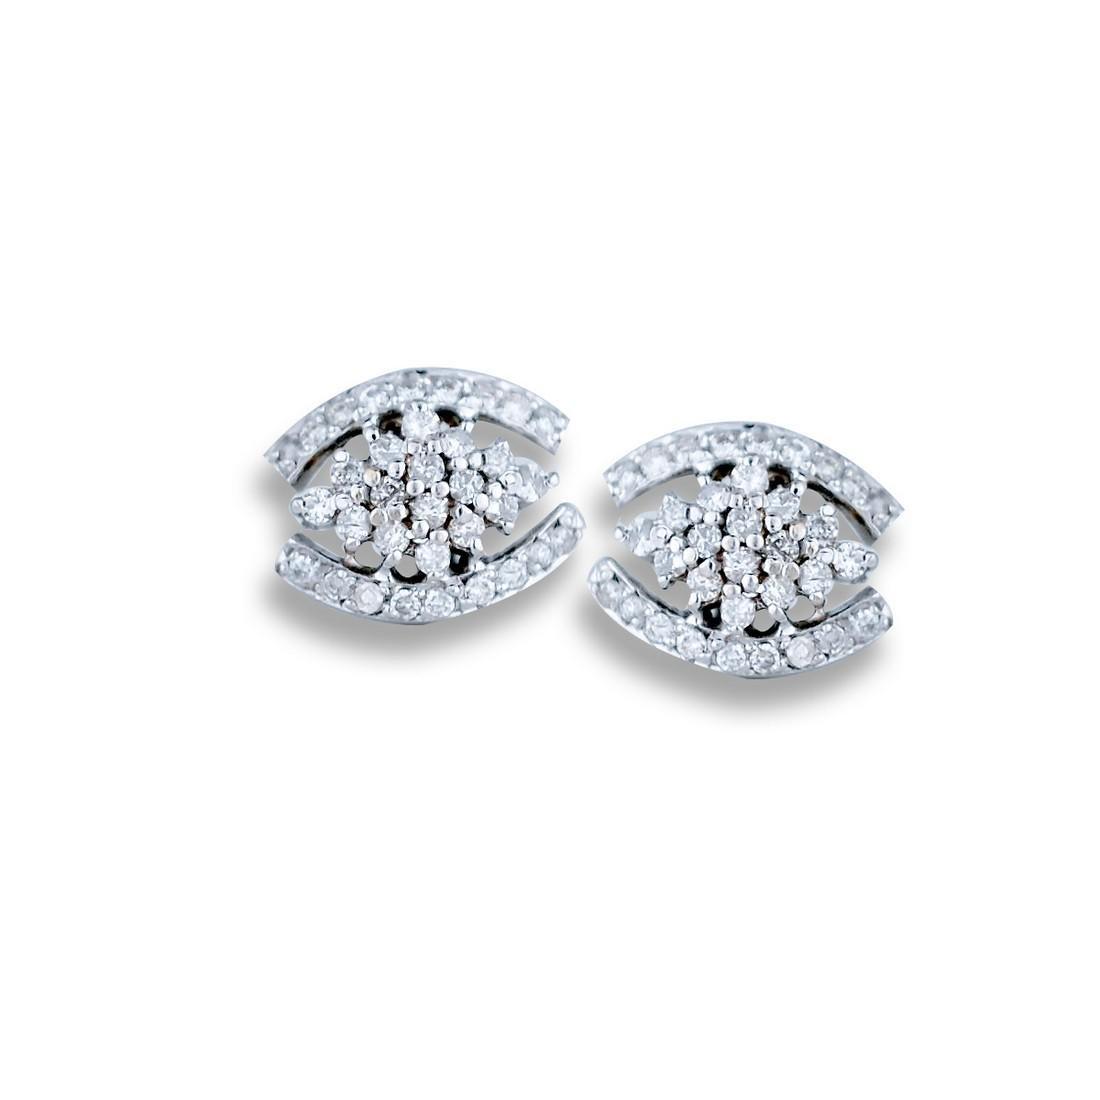 Pave Diamond Earrings, 14 Karat .75 Carat TW